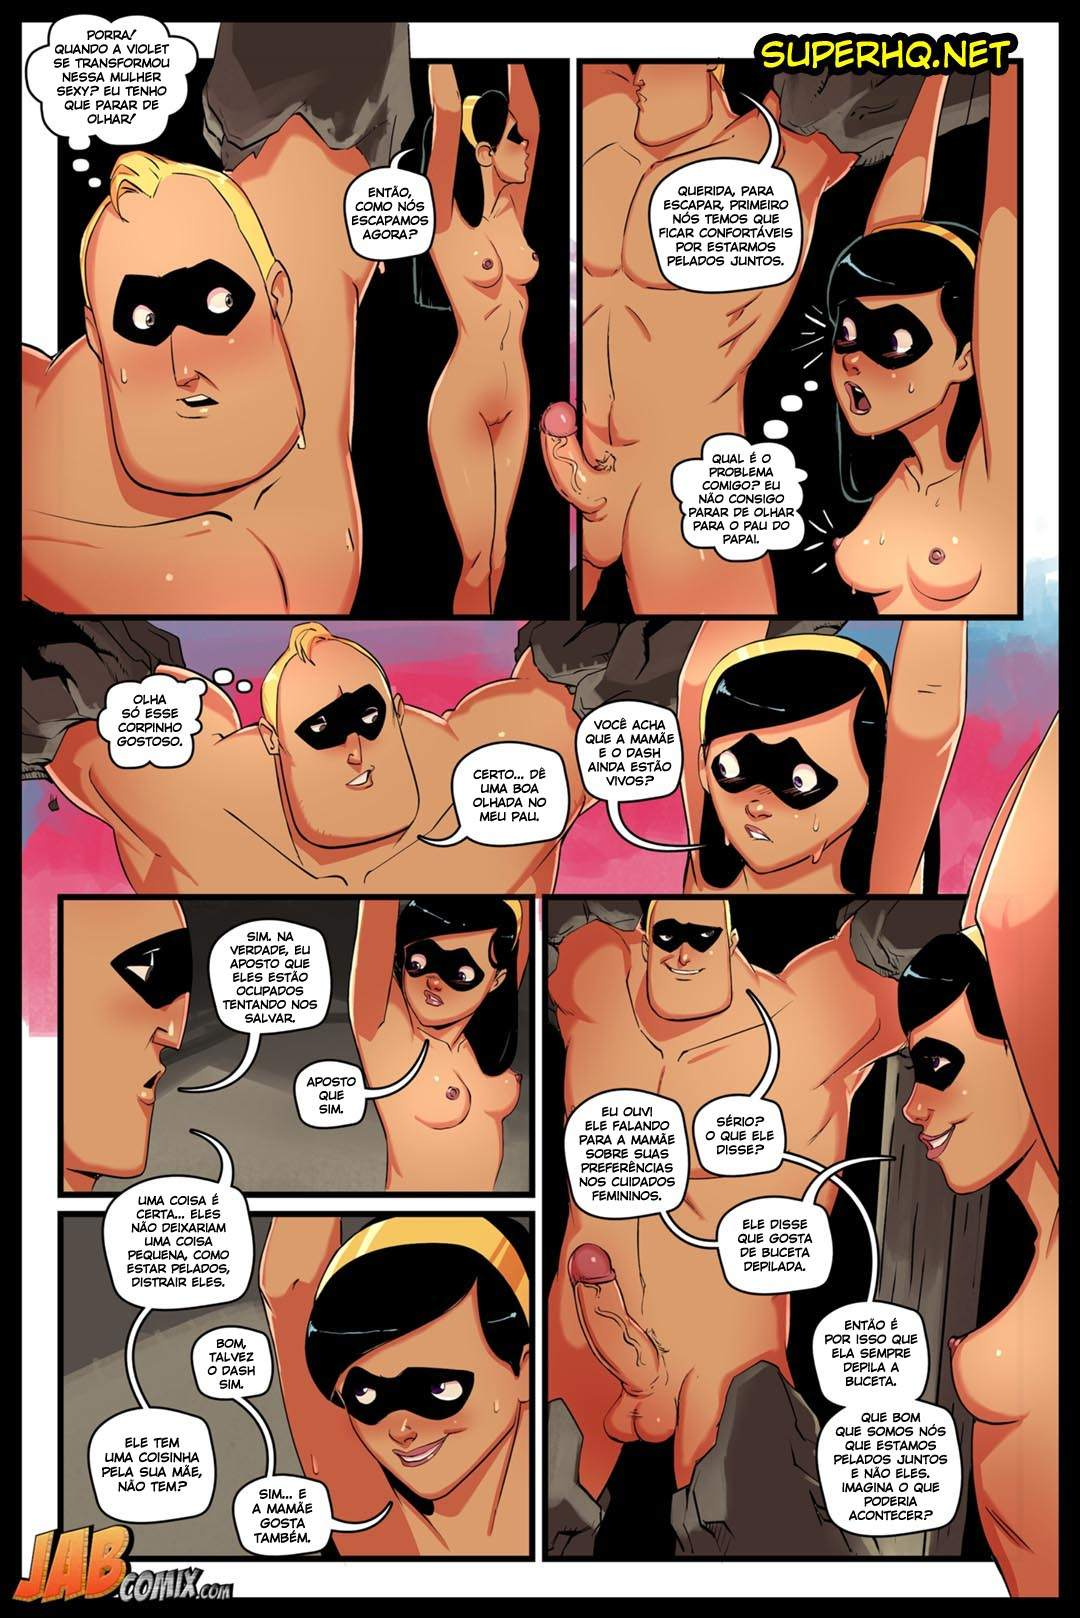 Os Improvaveis parte 2 The Hentai pt br 14 - hentai, comics-hq